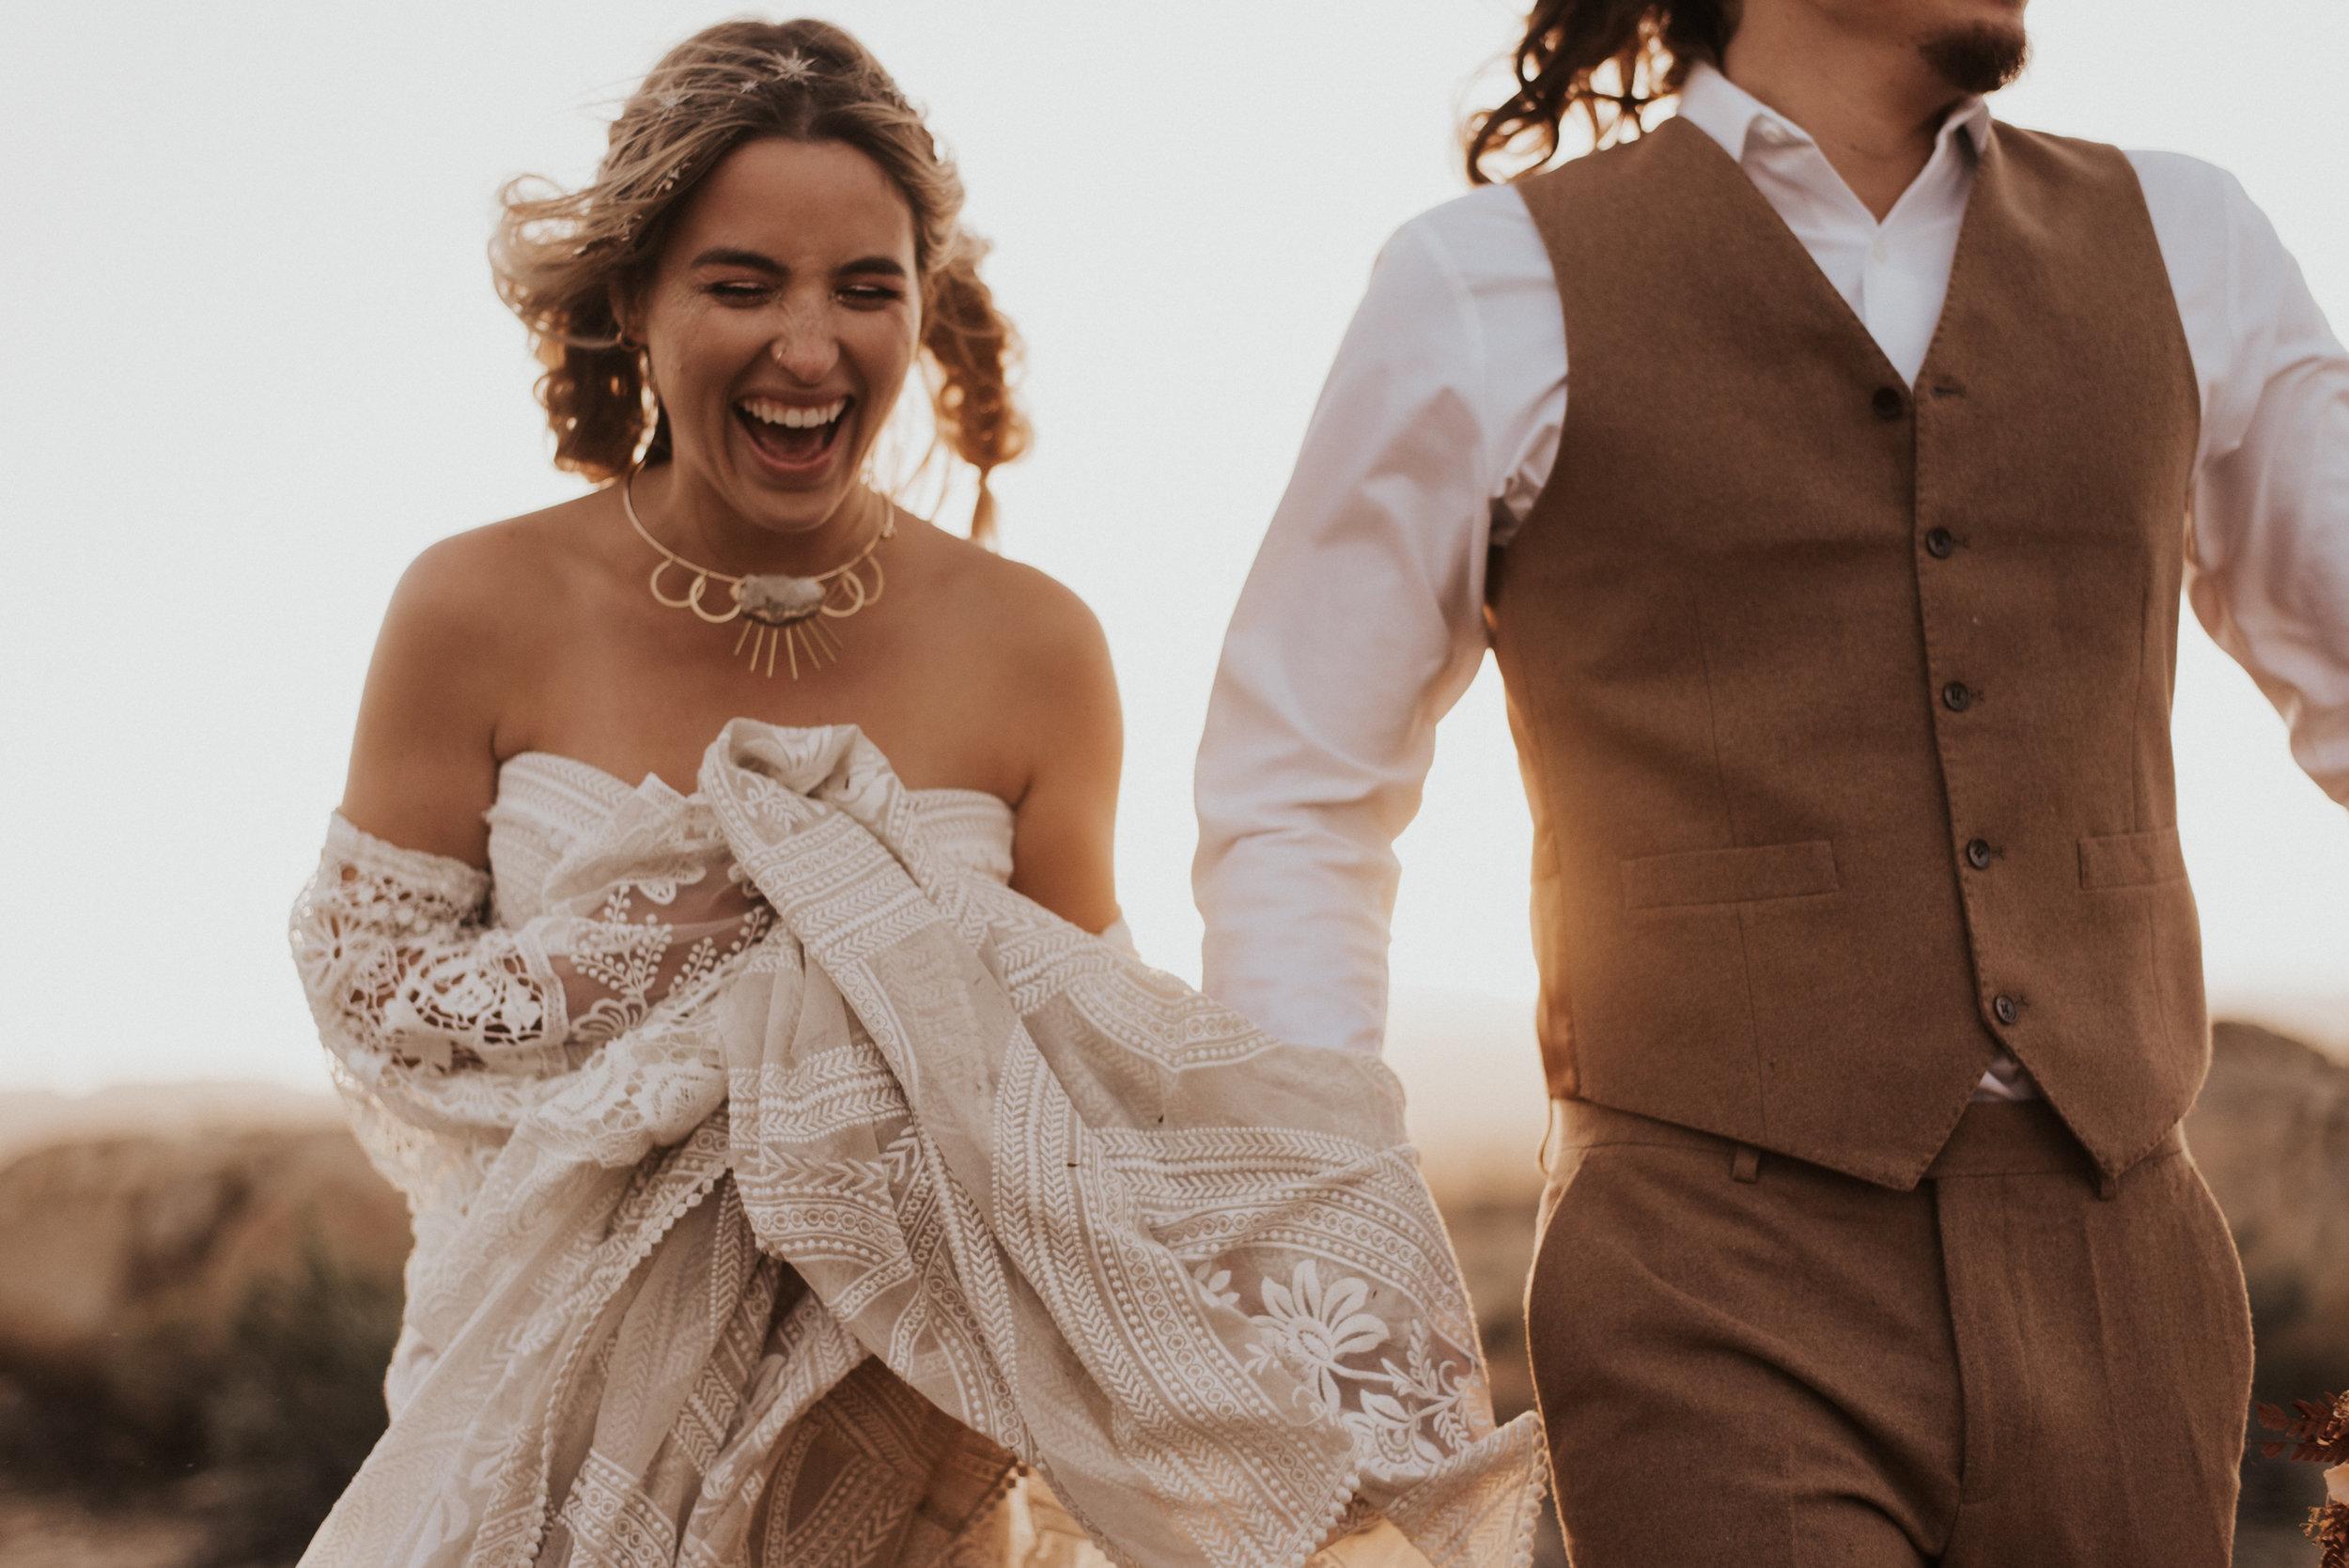 FortSt.John_photographer_TyraEPhotography_Wedding_Couple_Family_Photograhy_DawsonCreek_Elopement_Bride_Boduoir_Portraits-8472.jpg